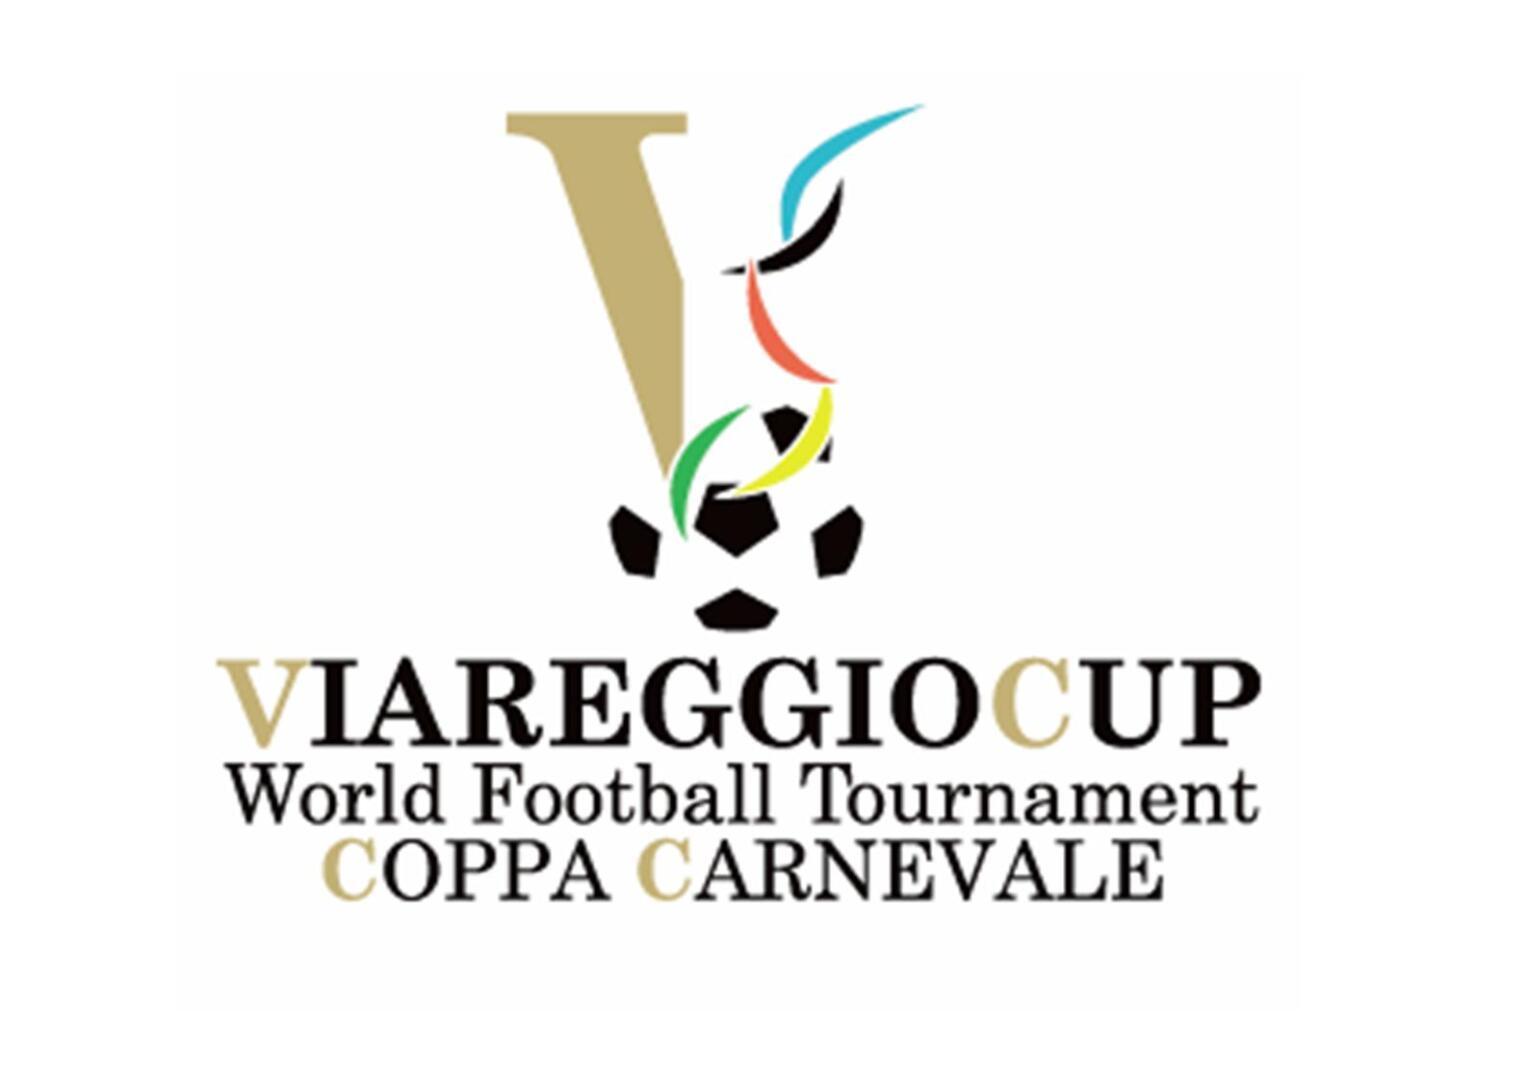 72ª VIAREGGIO CUP: 18 febbraio 2020 sorteggio gironi